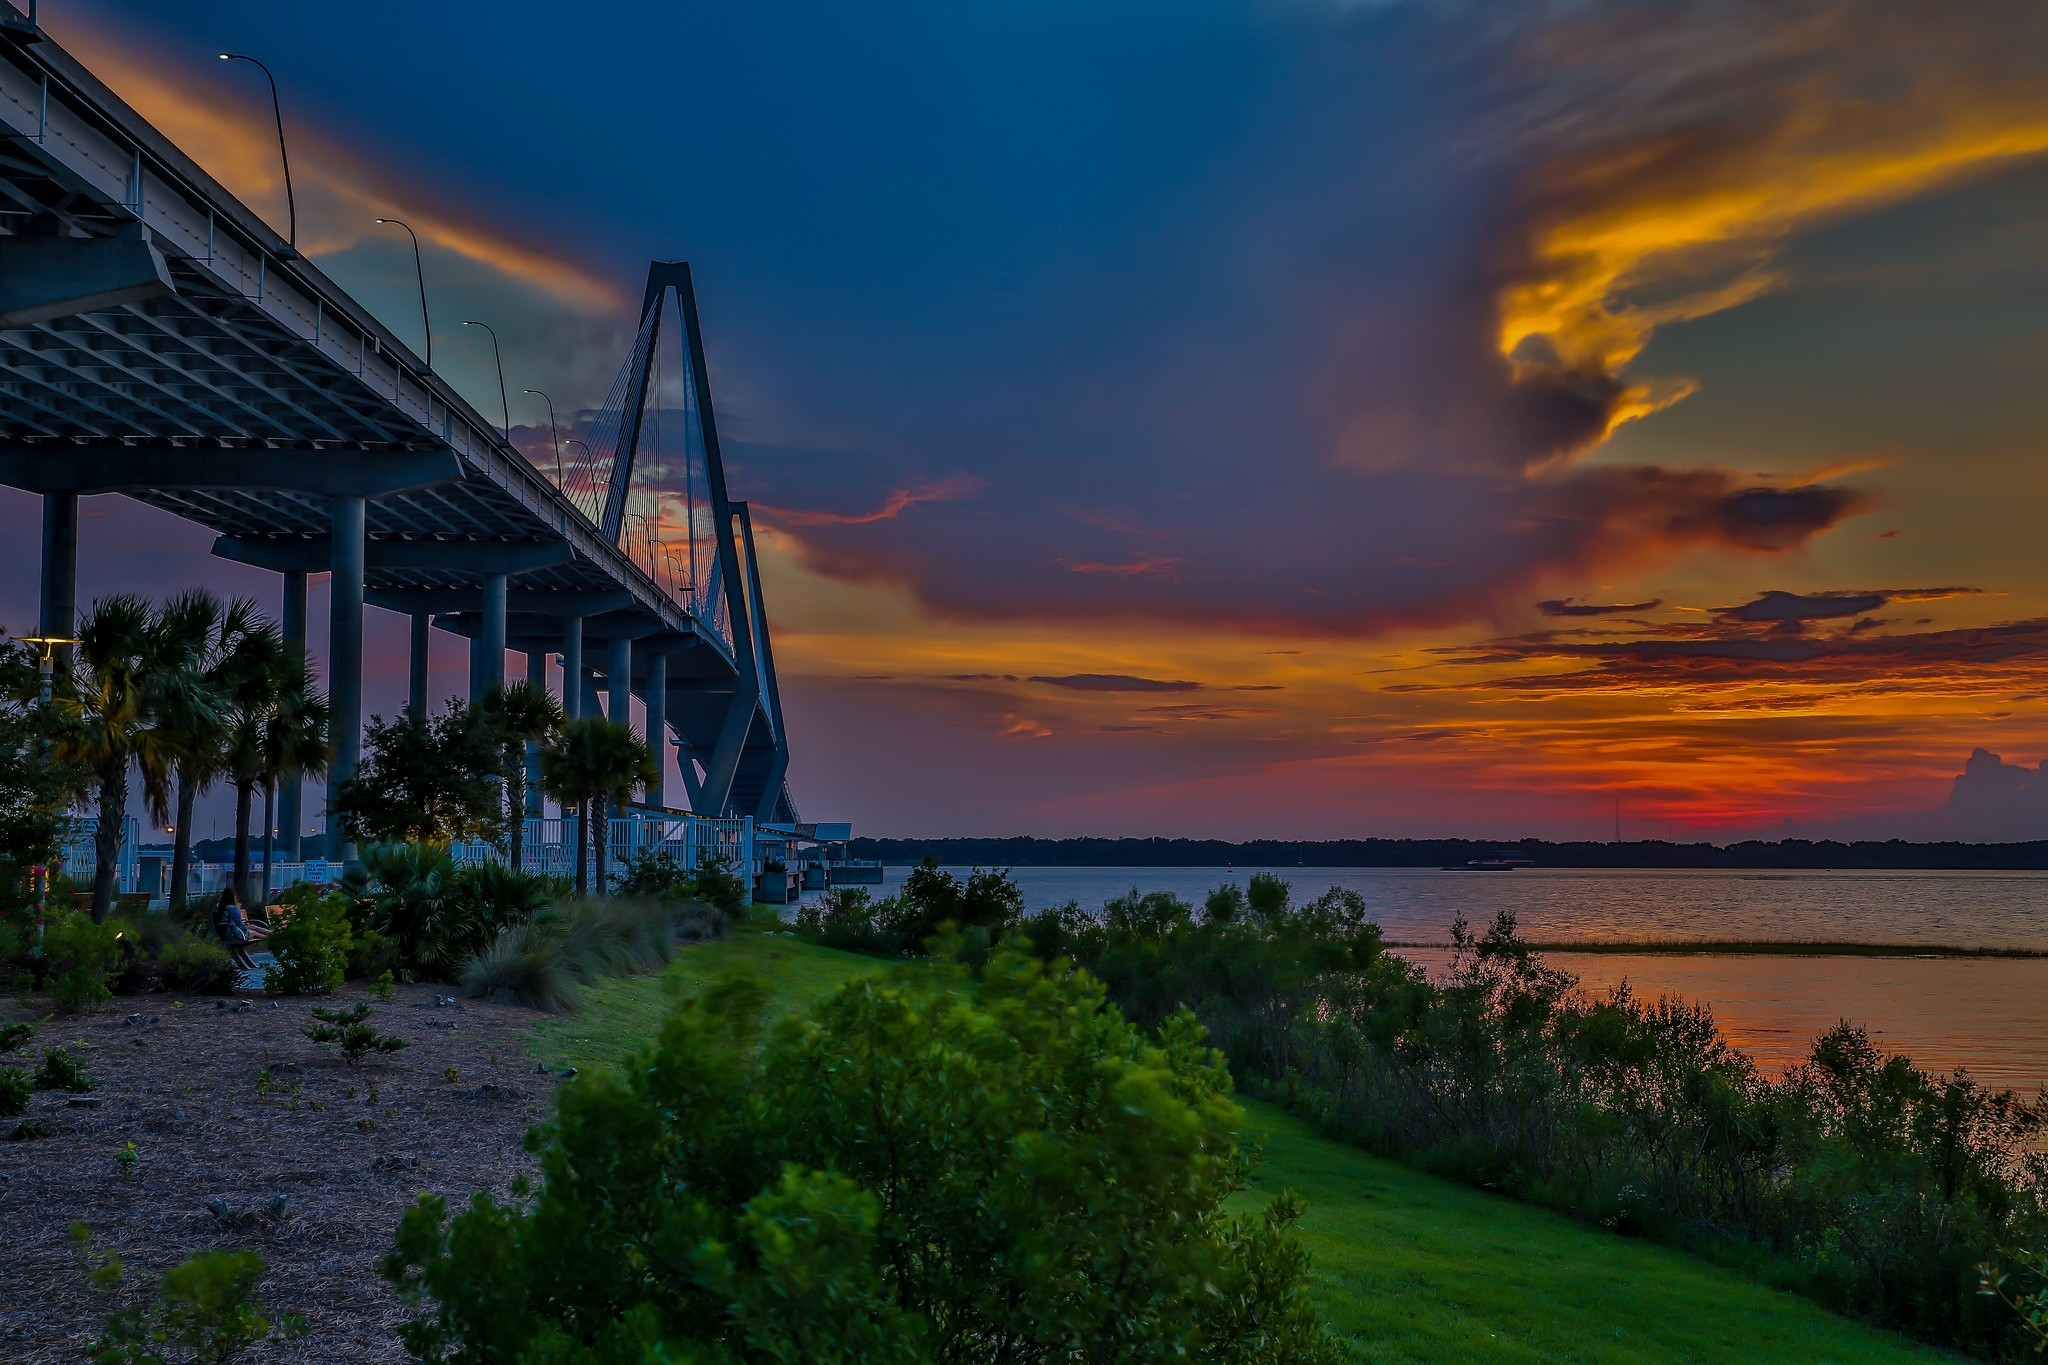 General 2048x1365 photography nature clouds landscape sunset sky bridge grass plants trees river lights South Carolina